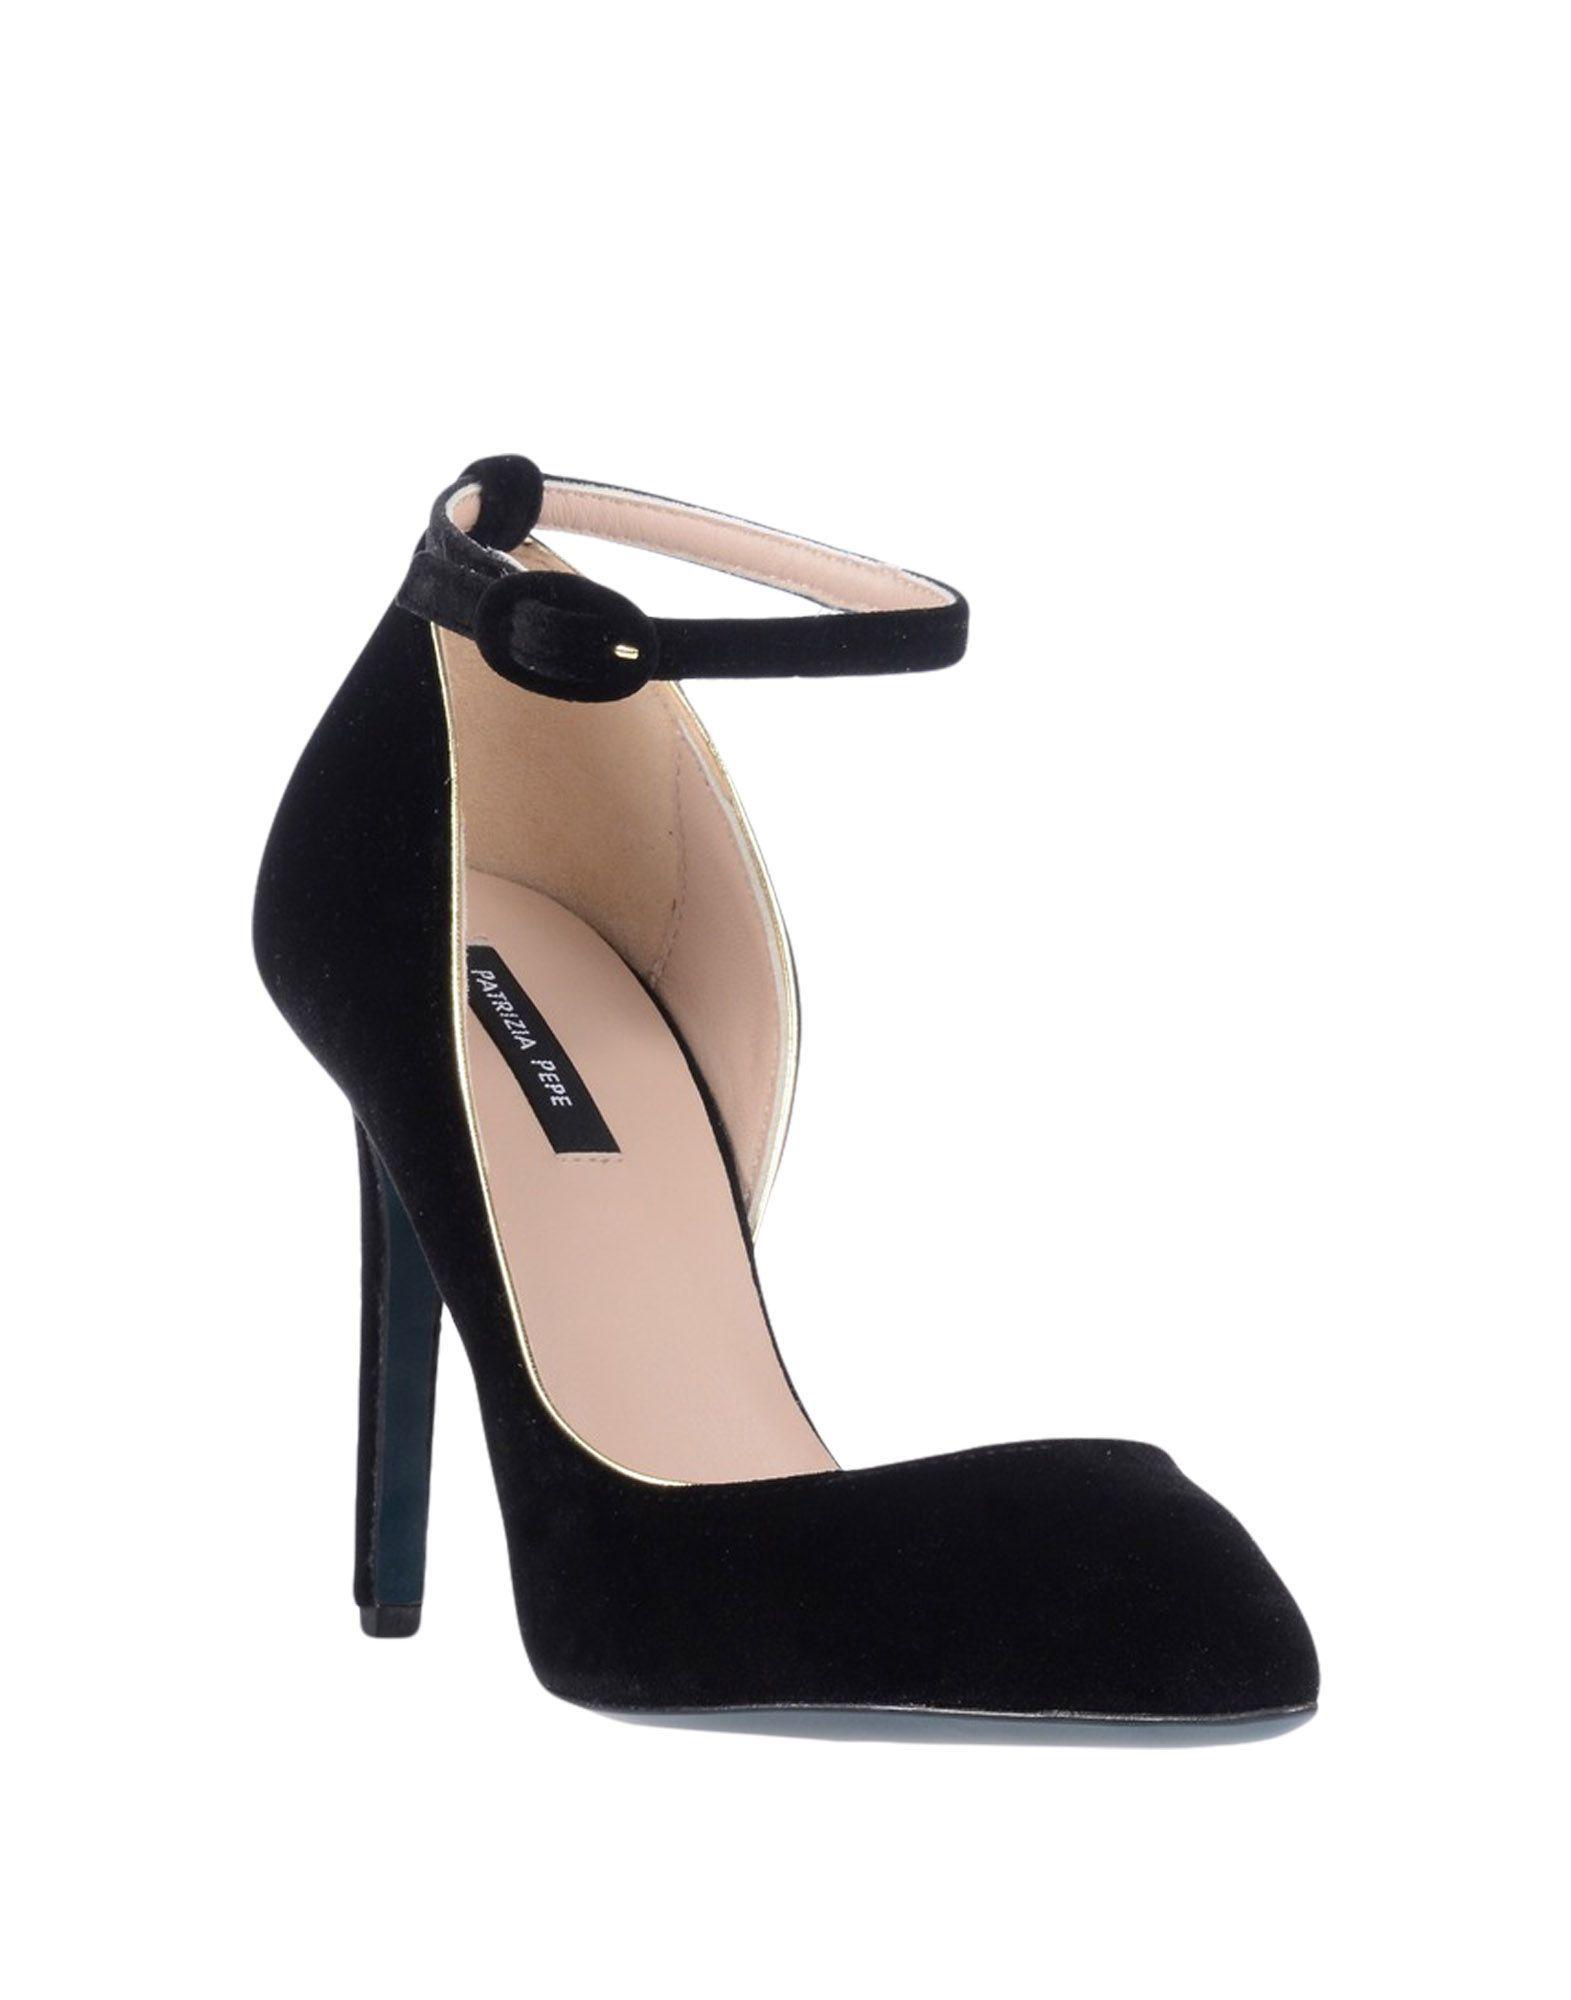 Patrizia Pepe Black Velvet Heels